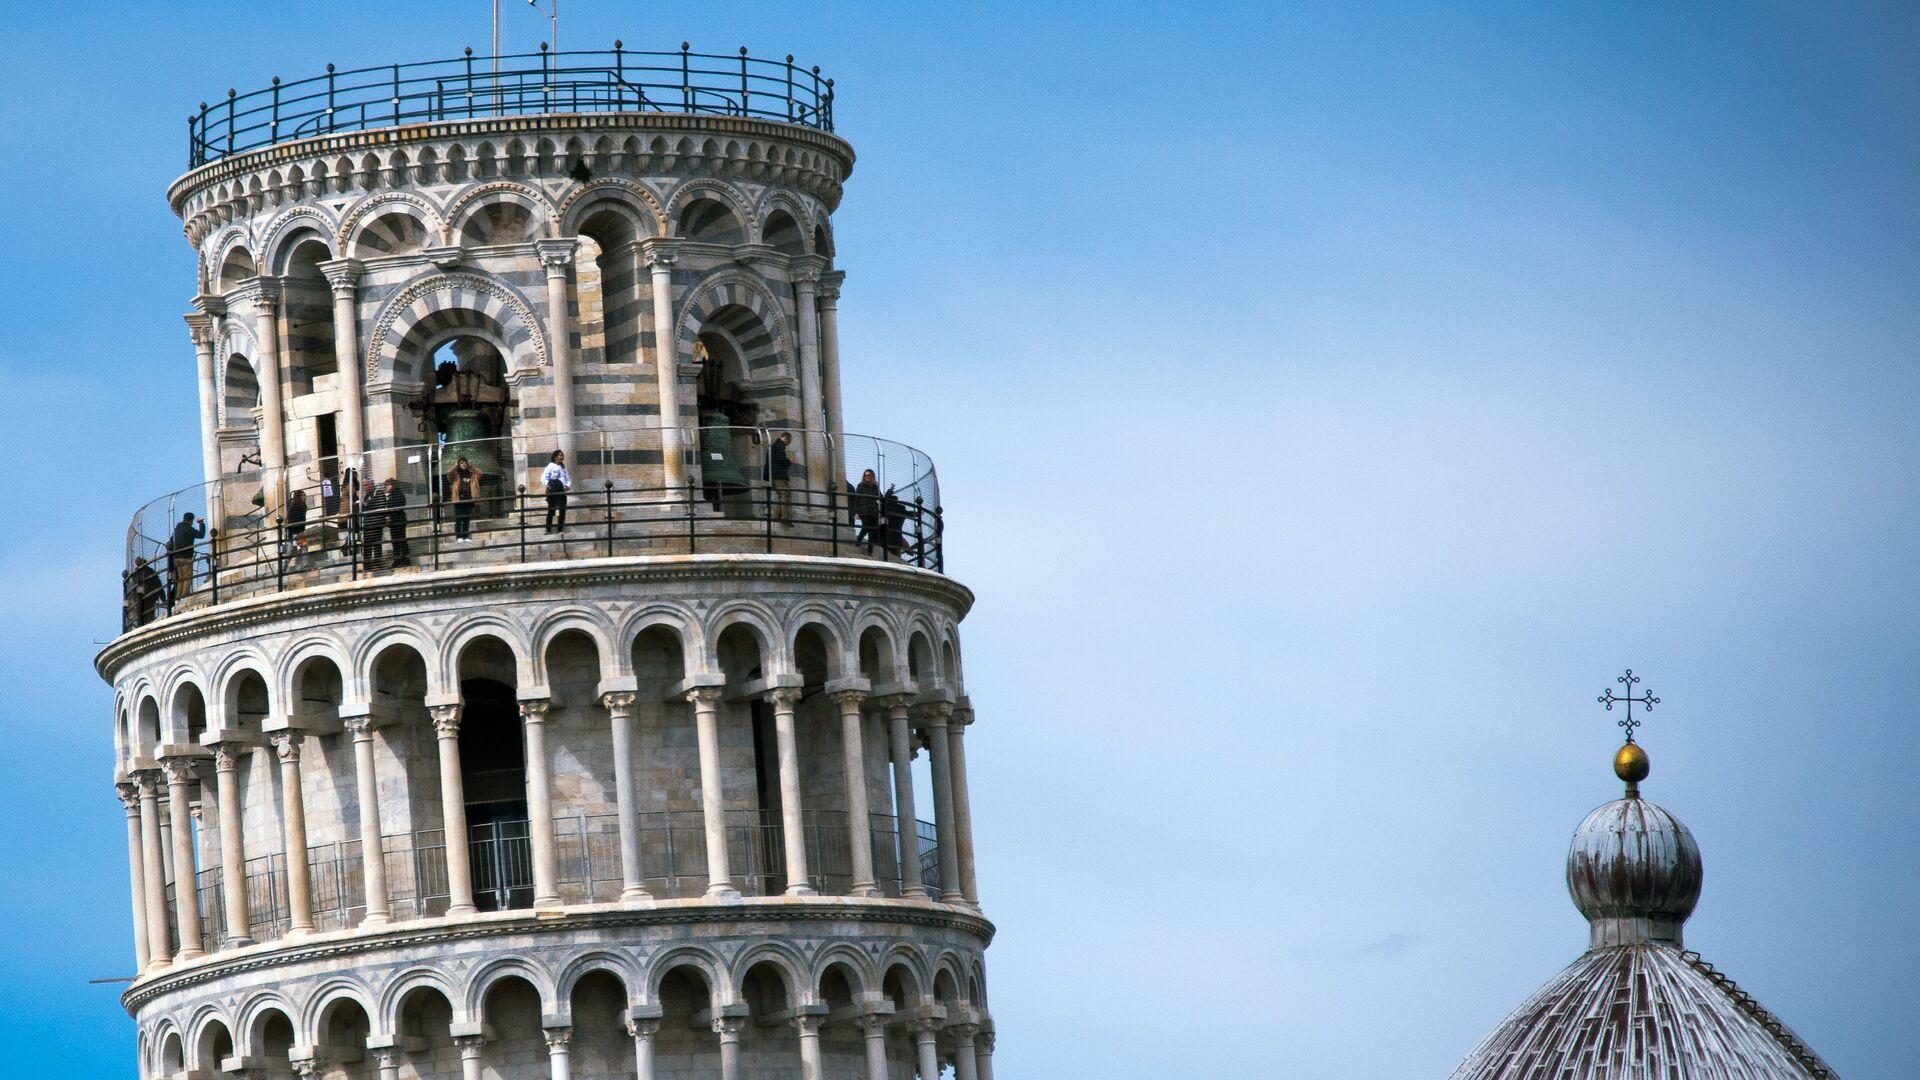 La torre di Pisa - Sputnik Italia, 1920, 10.05.2021